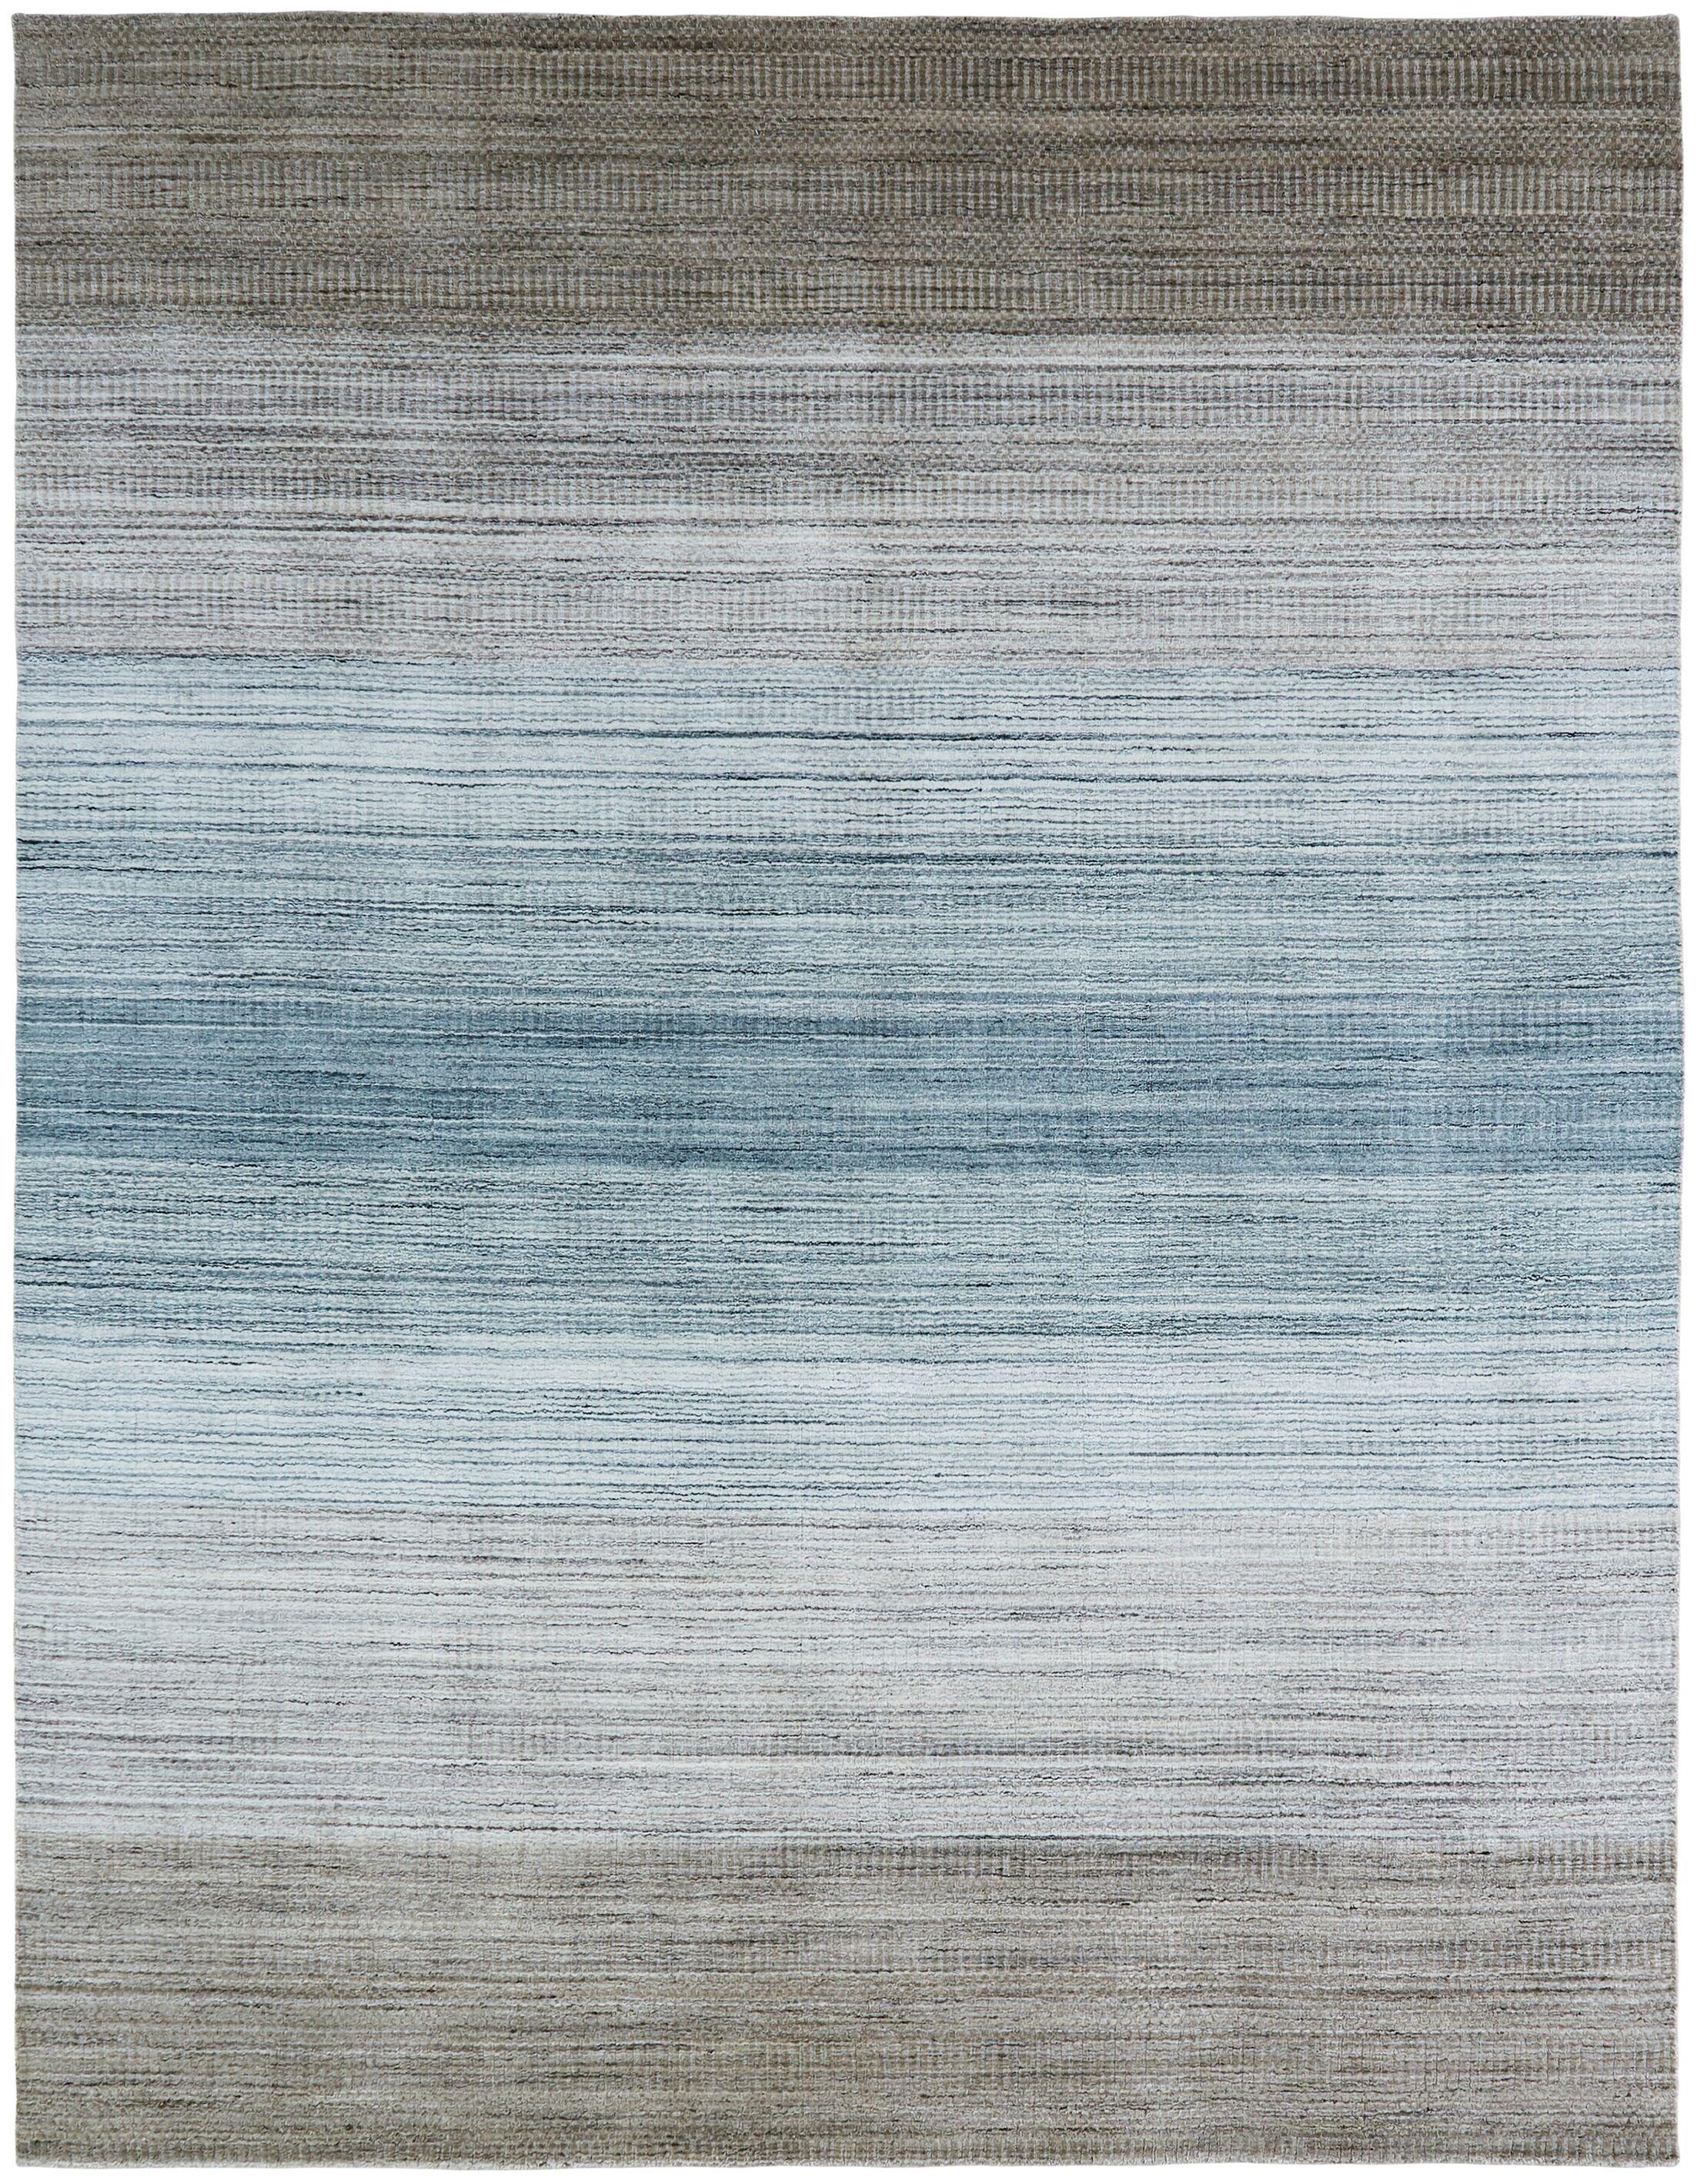 Madeley Handmade Wool/Silk Blue Area Rug Rug Size: Rectangle 2' x 3'